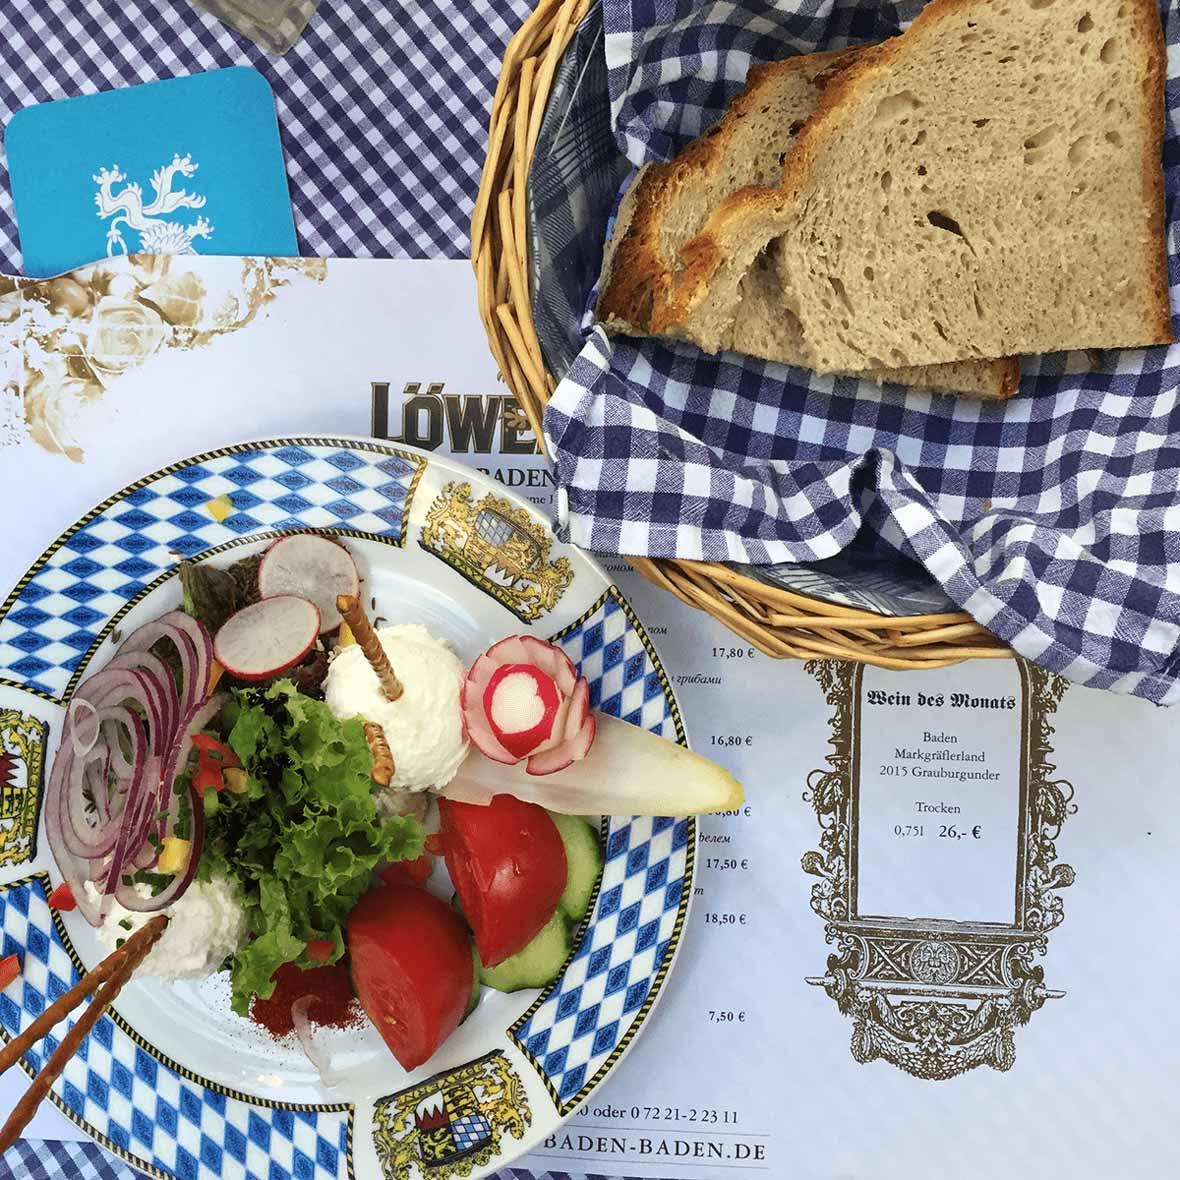 Baden Baden Cuisine Prix german vegetarian food - what to eat (and where!)